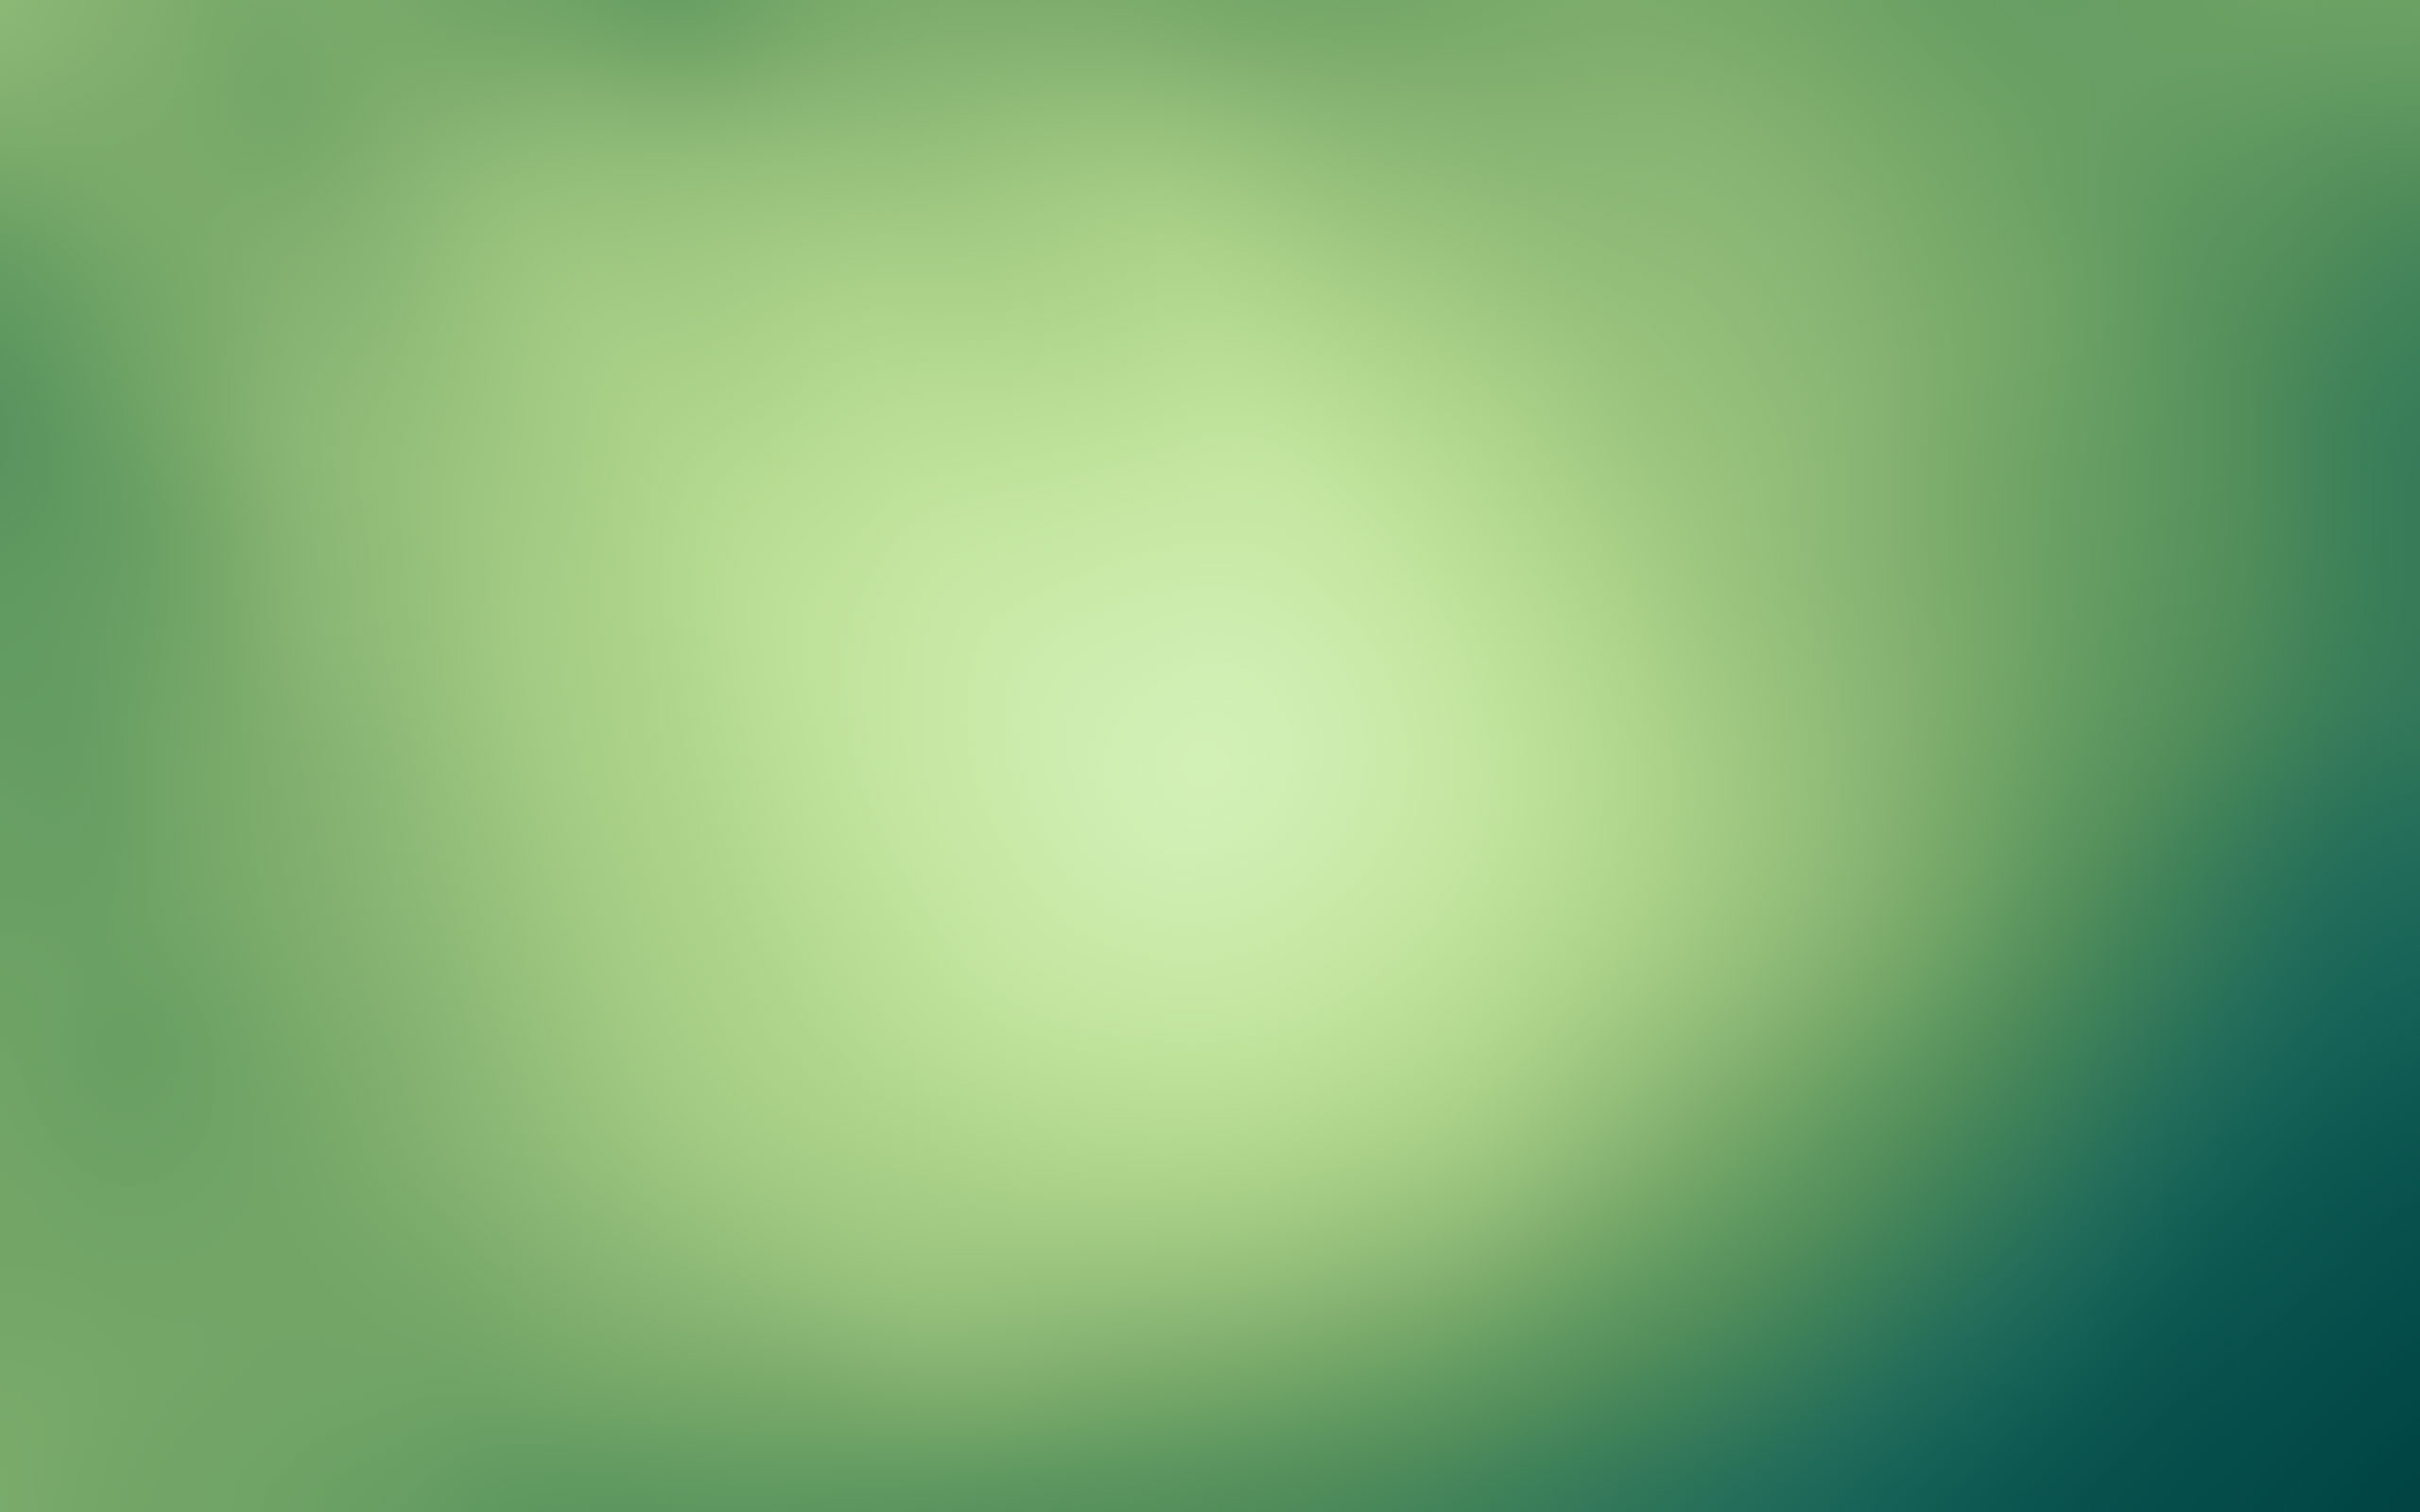 HD-Green-Background-July-23-20141.jpg